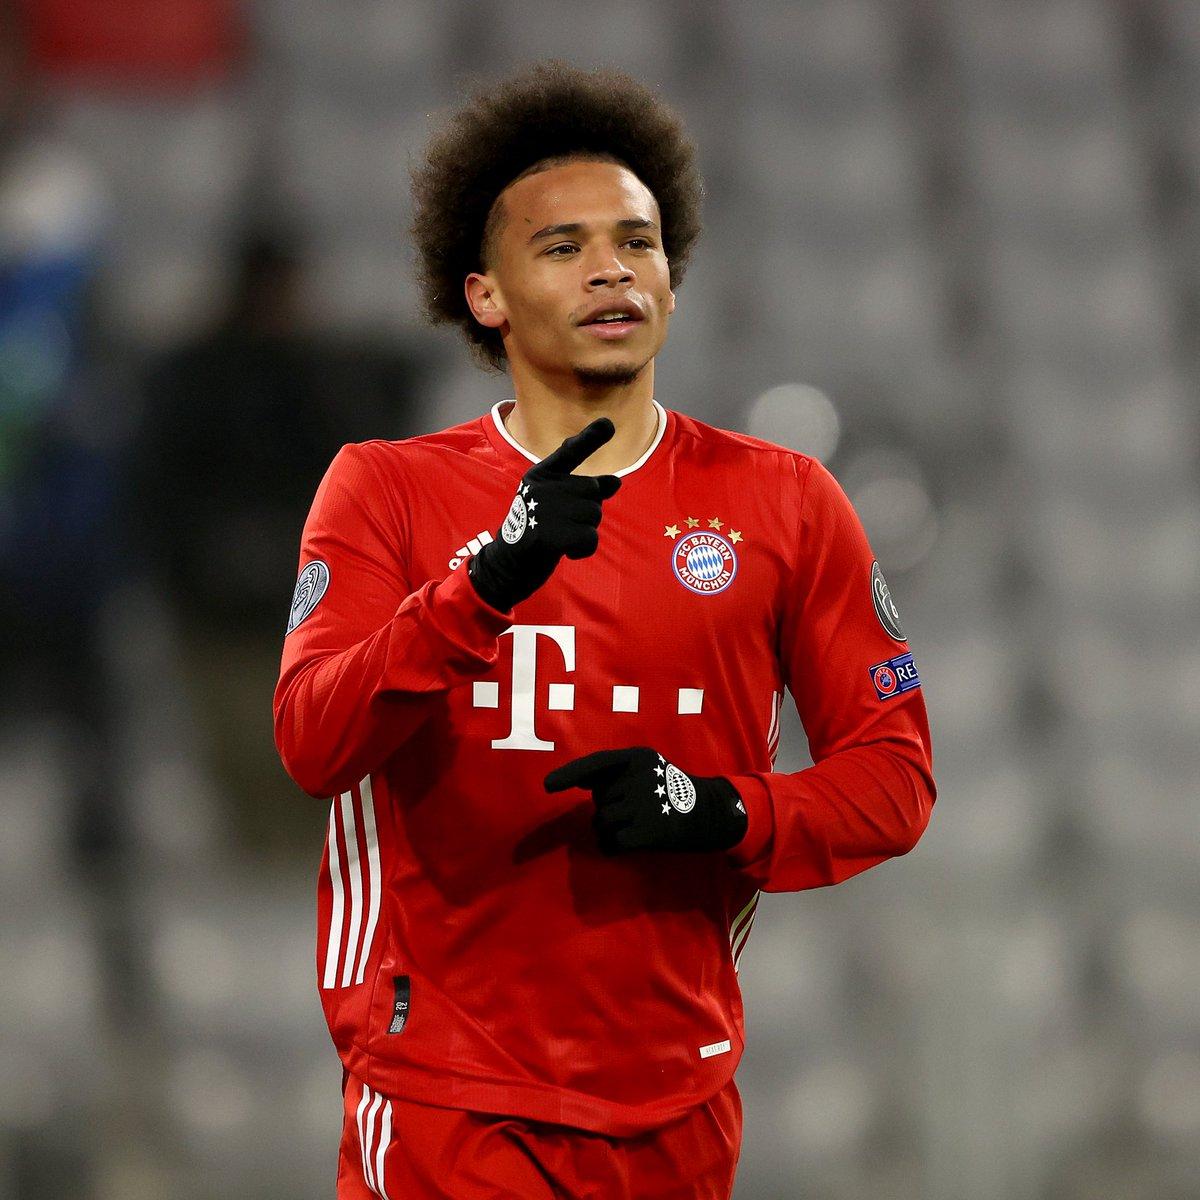 @ChampionsLeague's photo on Bayern